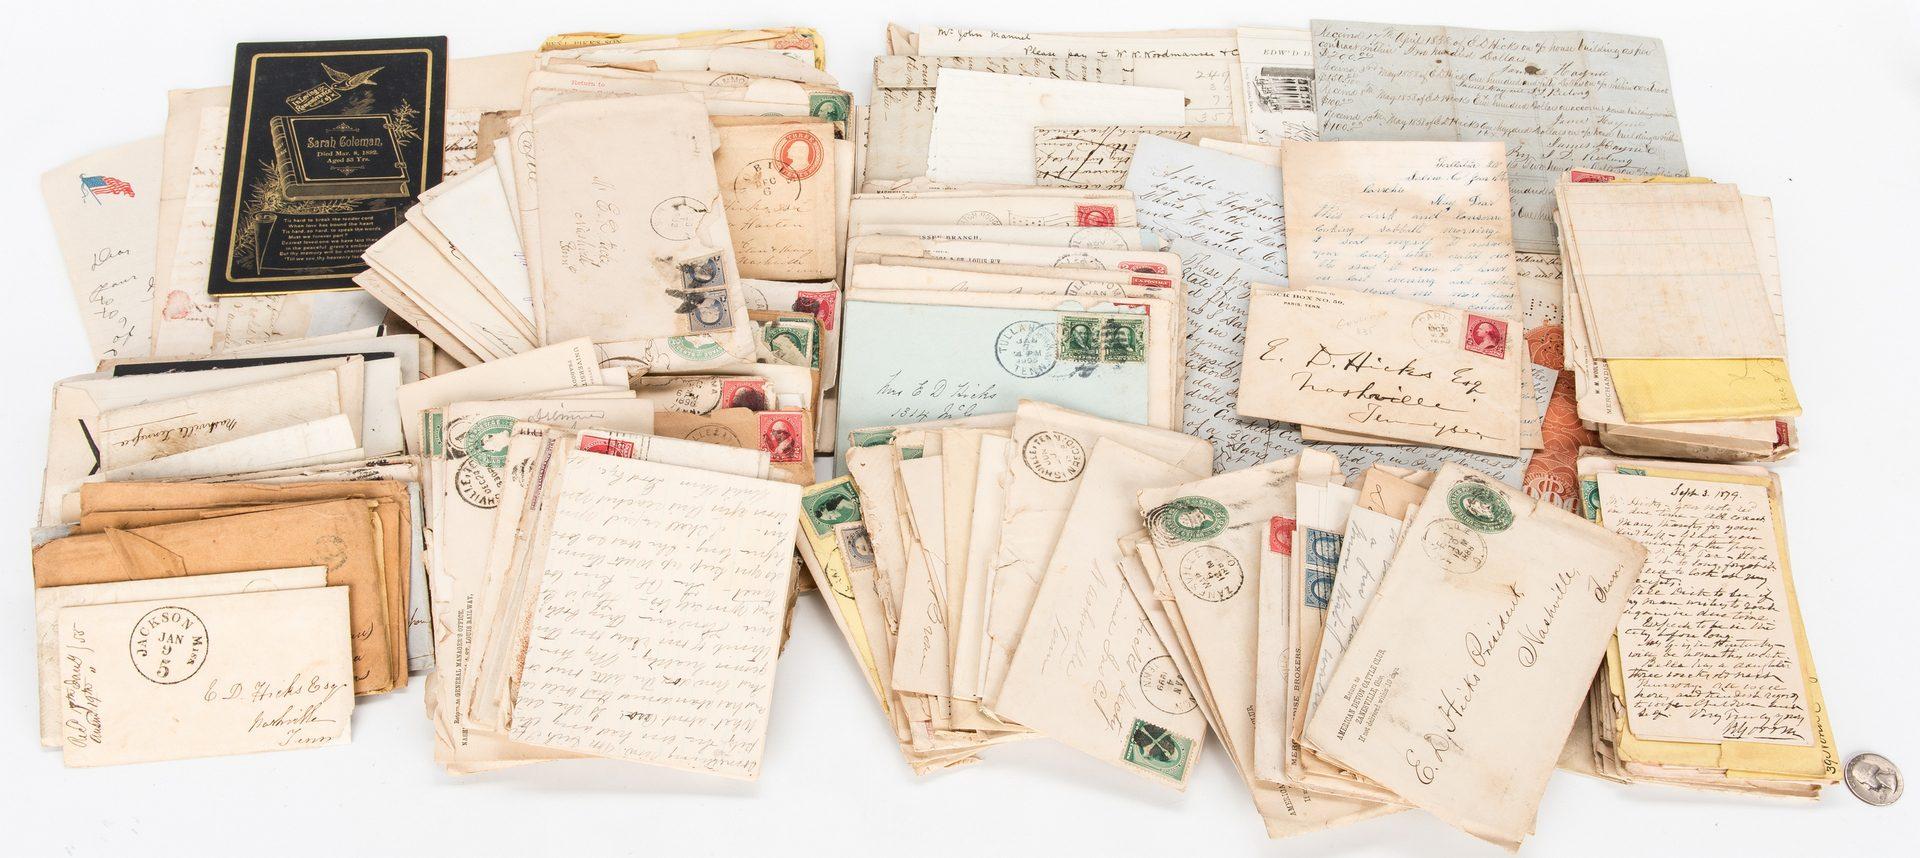 Lot 313: Edward D. Hicks Family, Nashville, TN Archive, 200 plus items